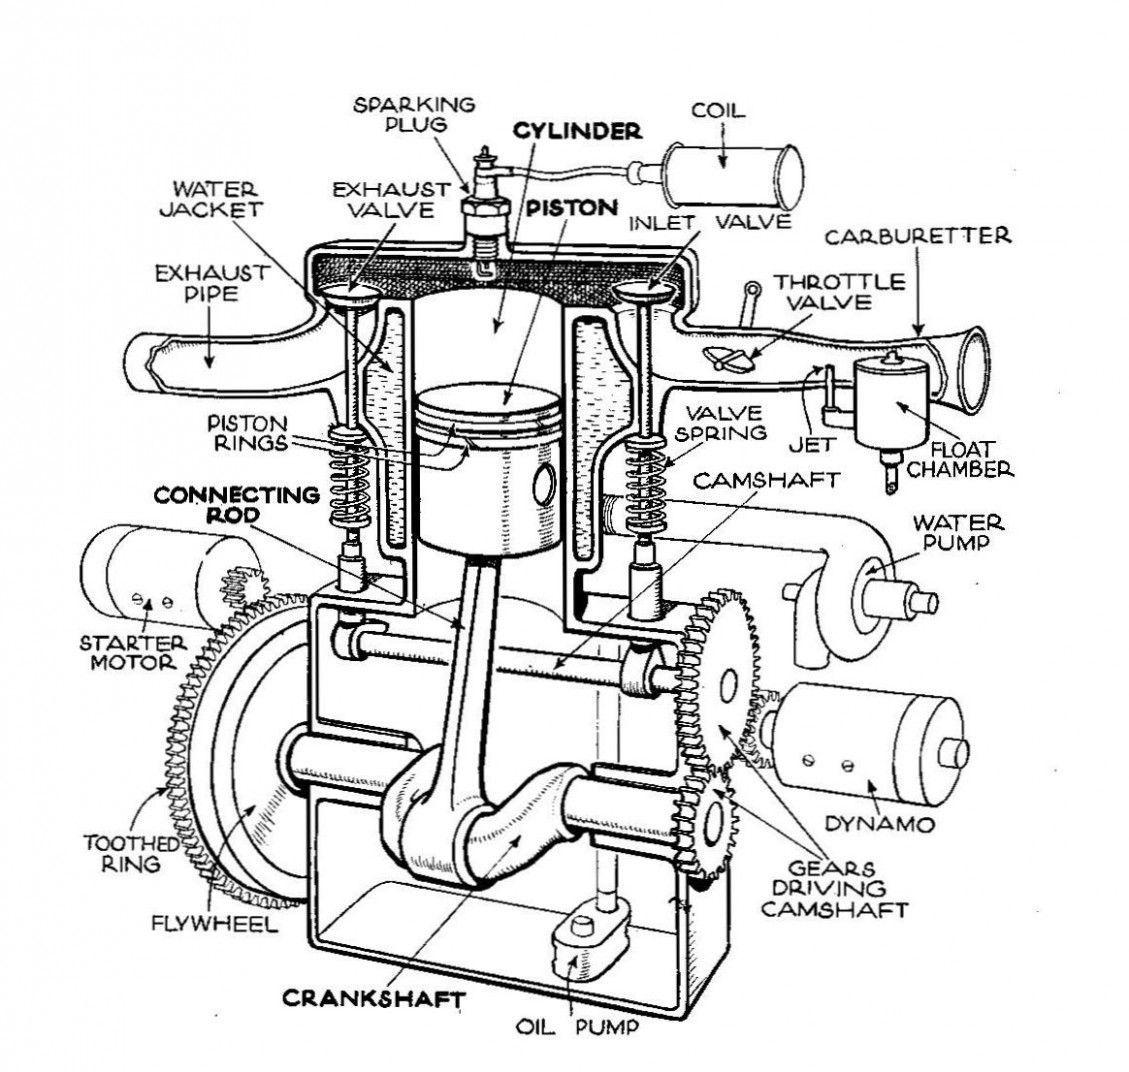 Engine Diagram Labeled